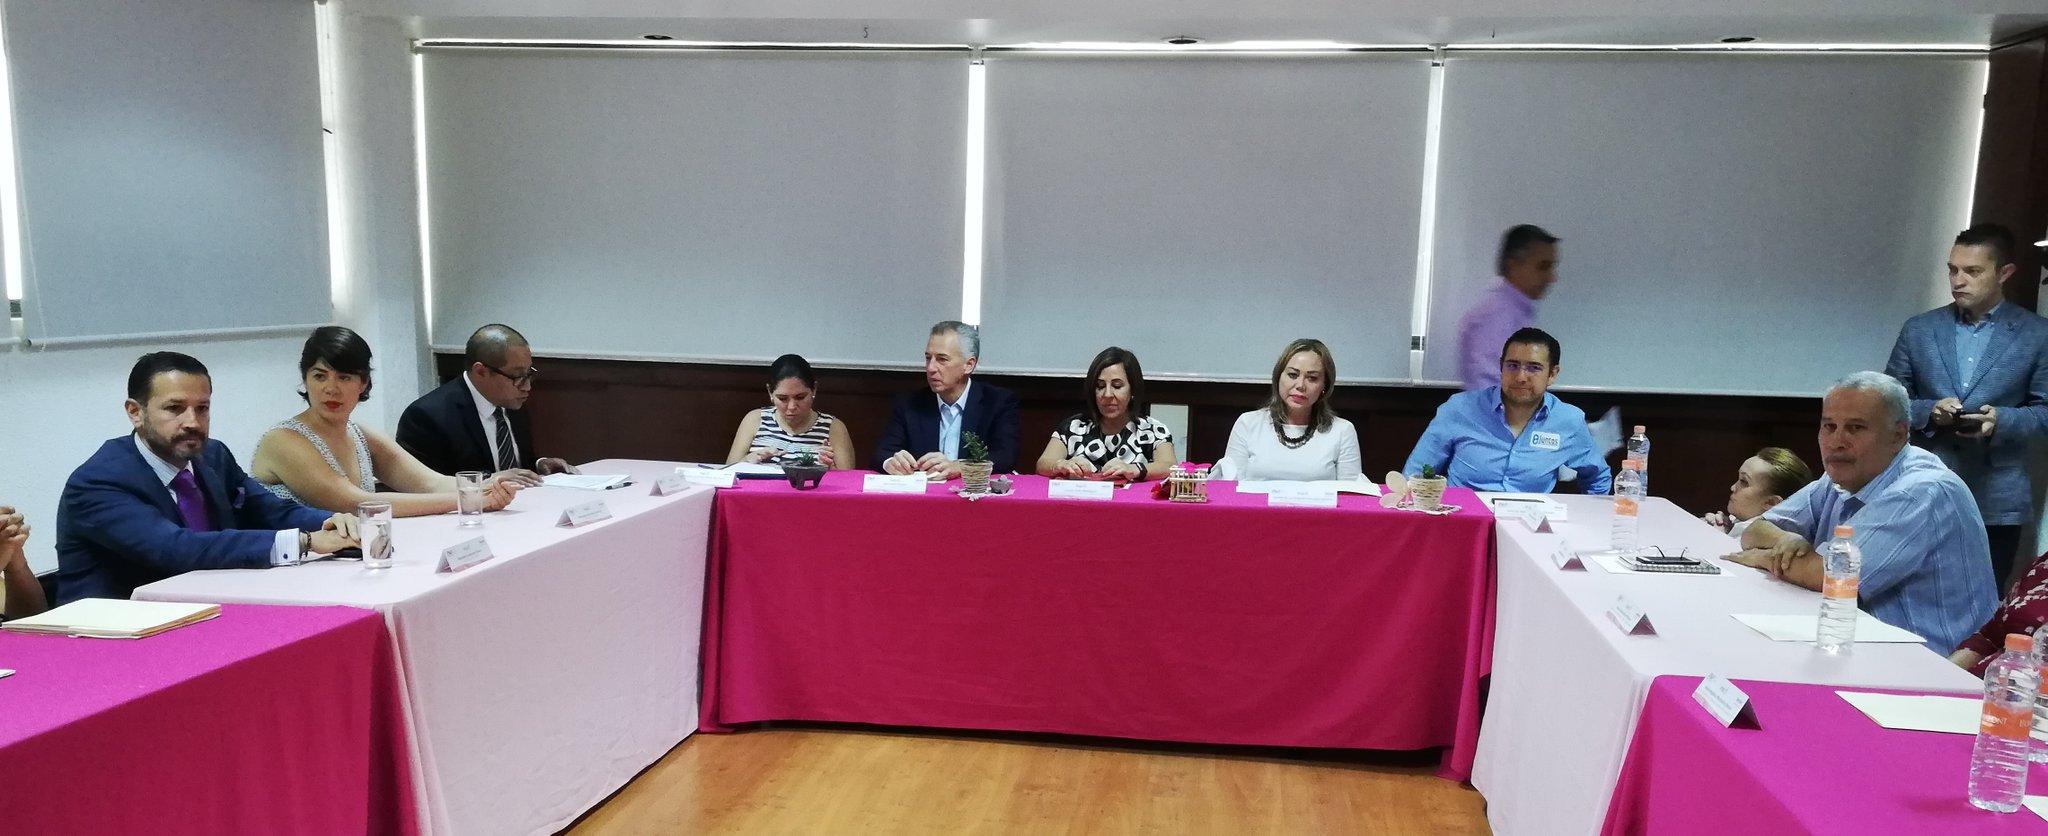 Firman convenio para socializar derecho de acceso a la información entre grupos vulnerables